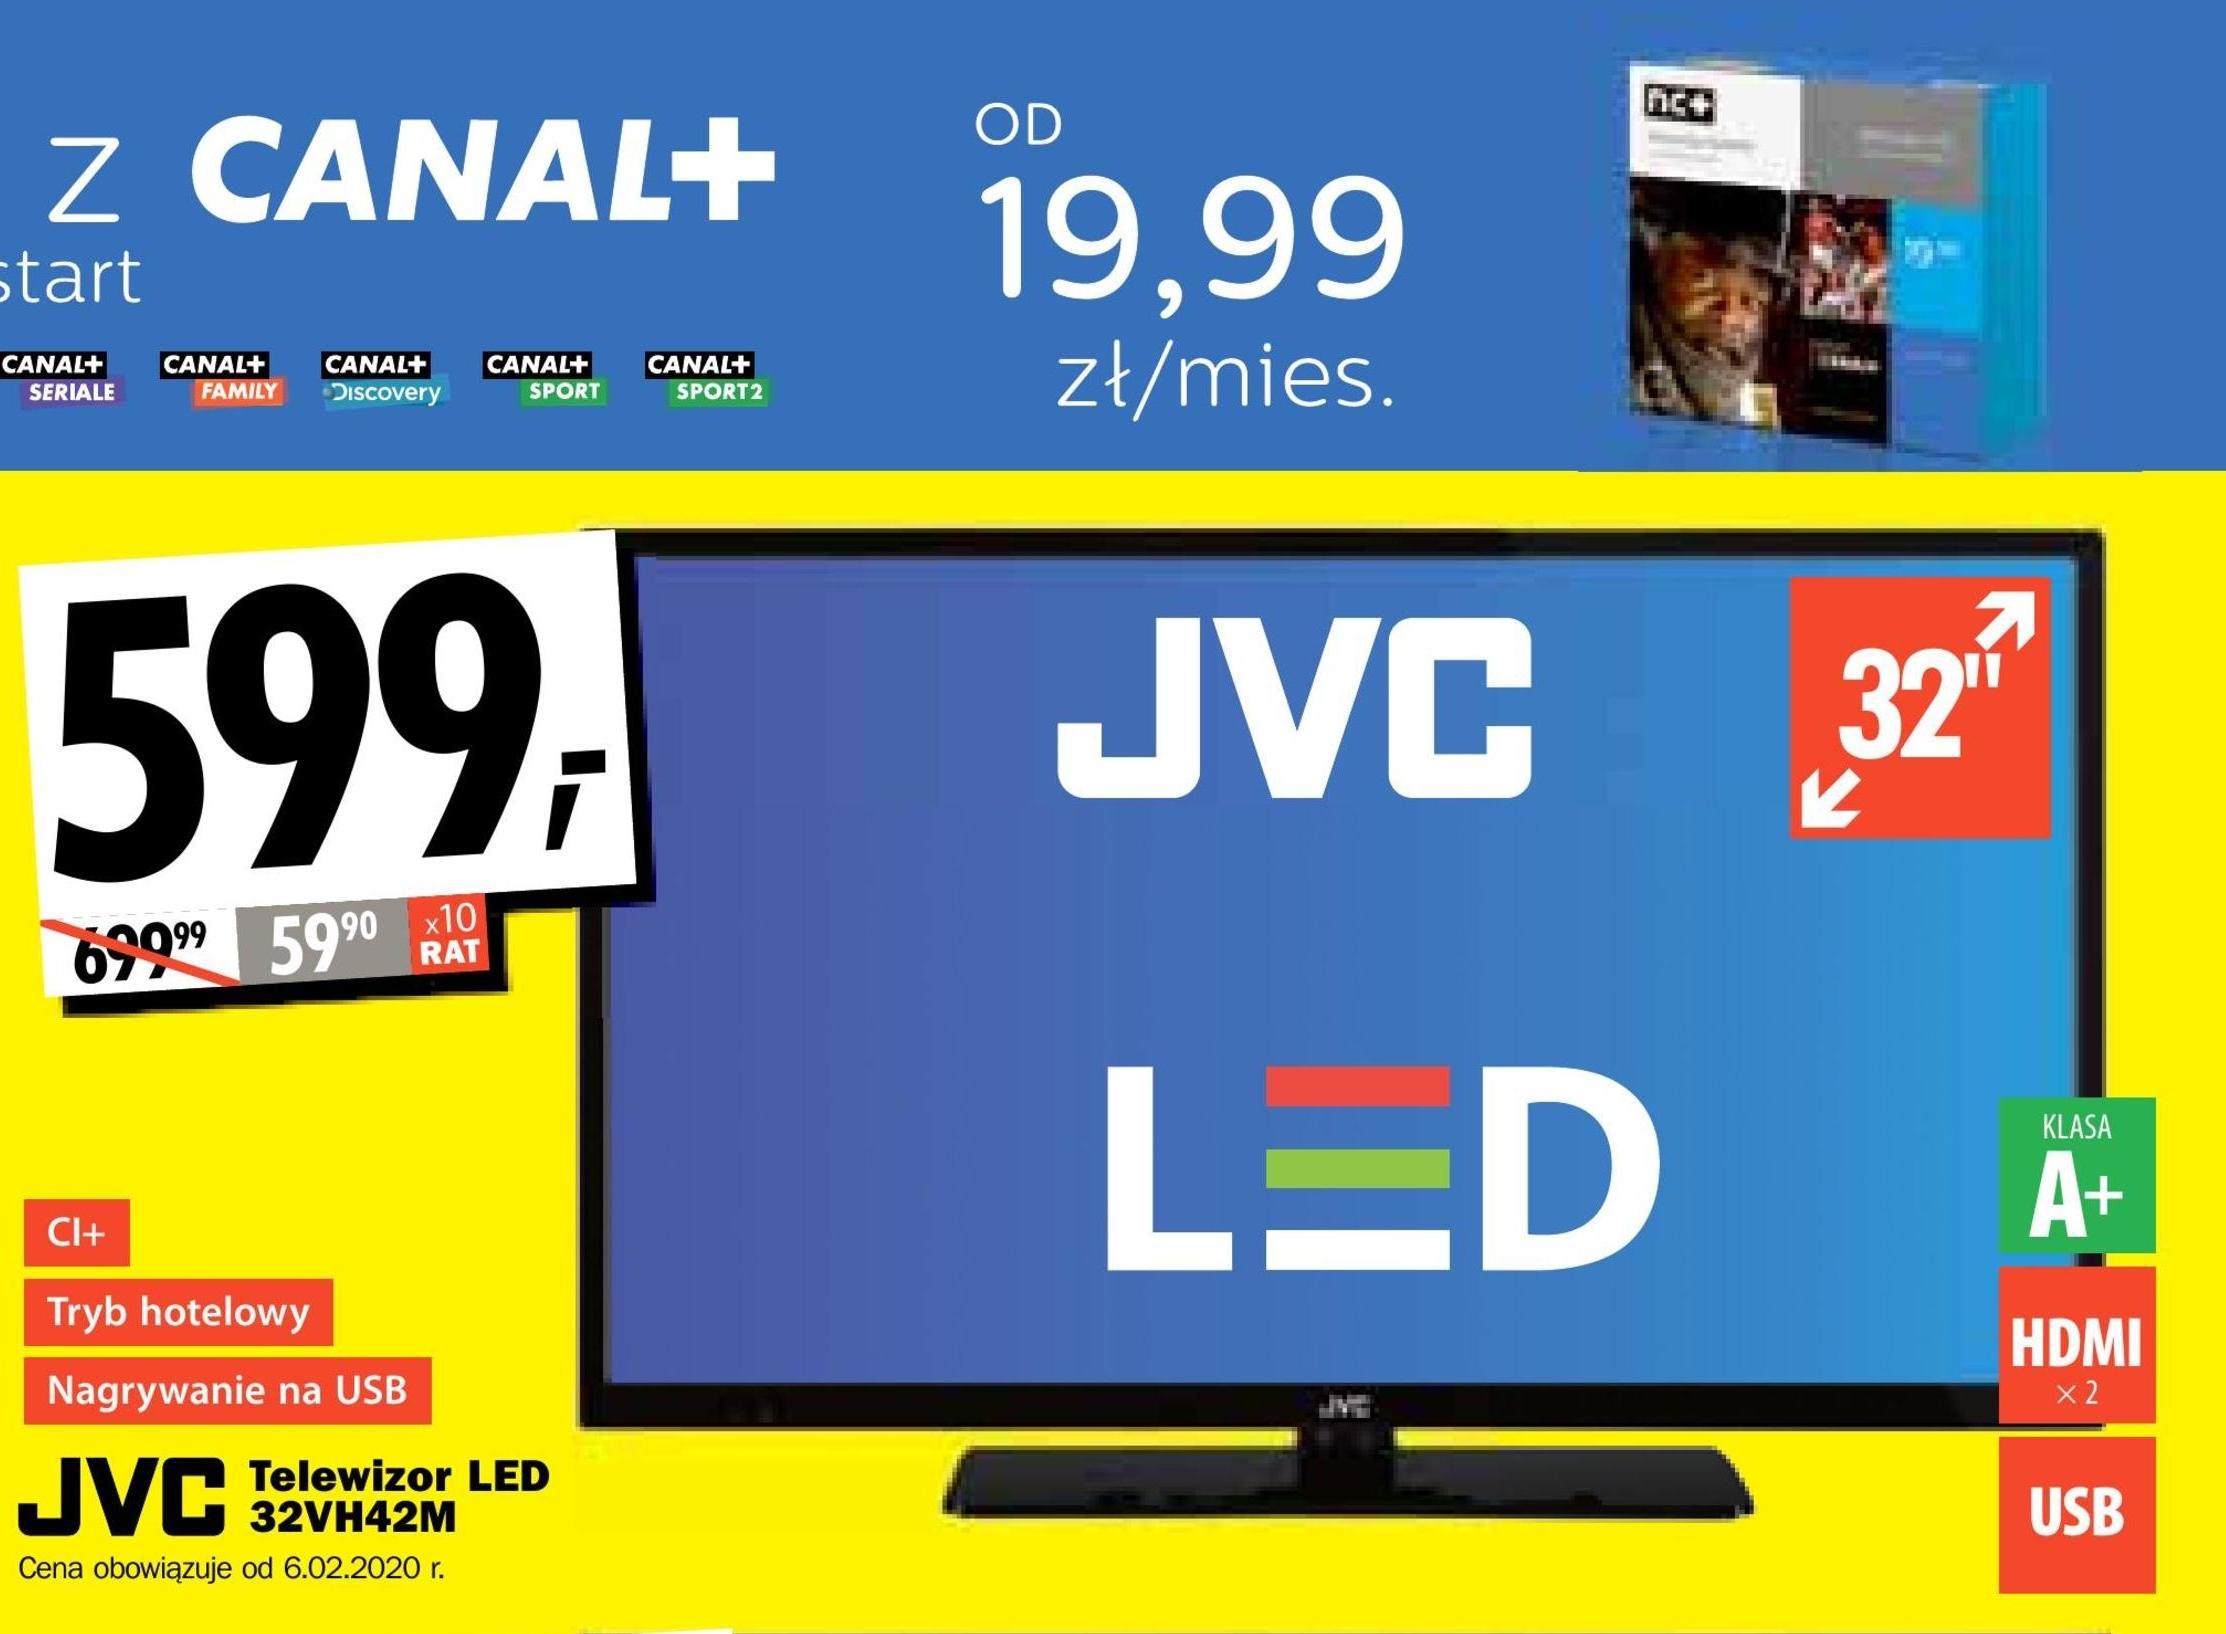 Telewizor LED 32VH42M JVC niska cena